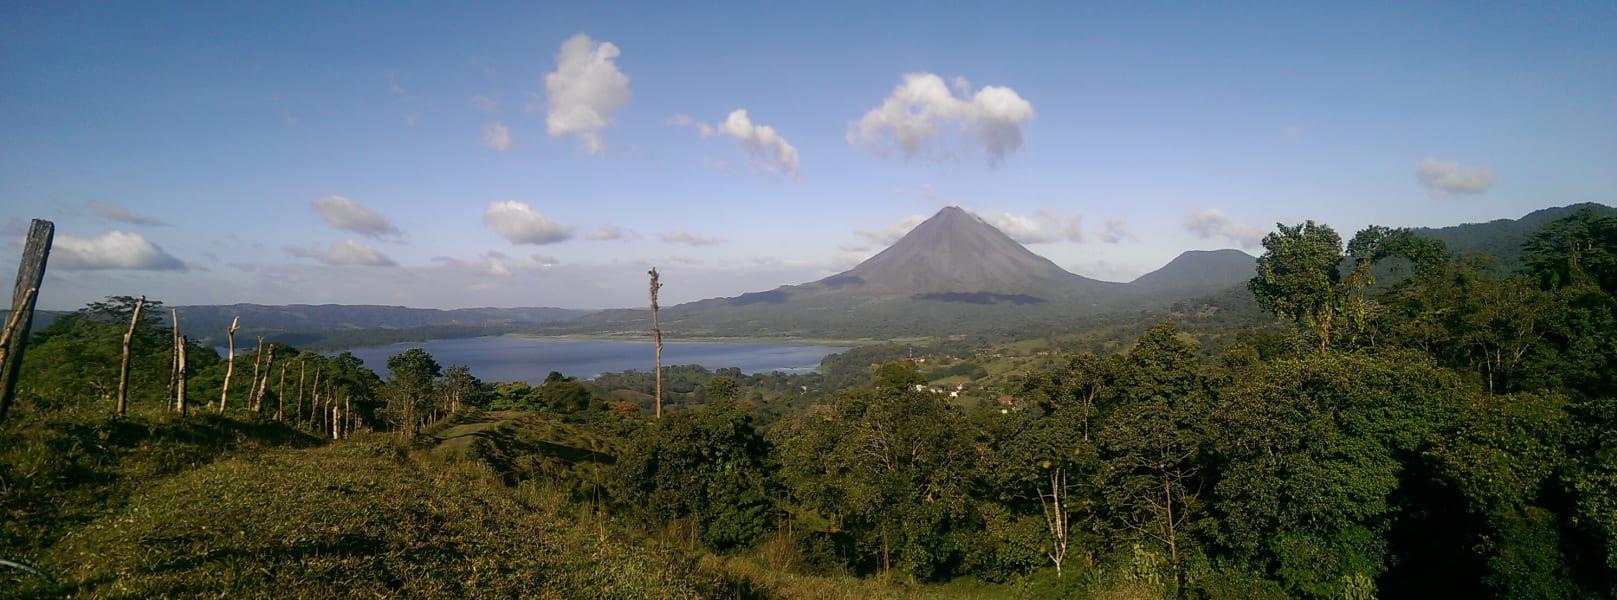 Rancho Margot Deluxe Bungalows at Rancho Margot El Castillo Costa Rica undefined